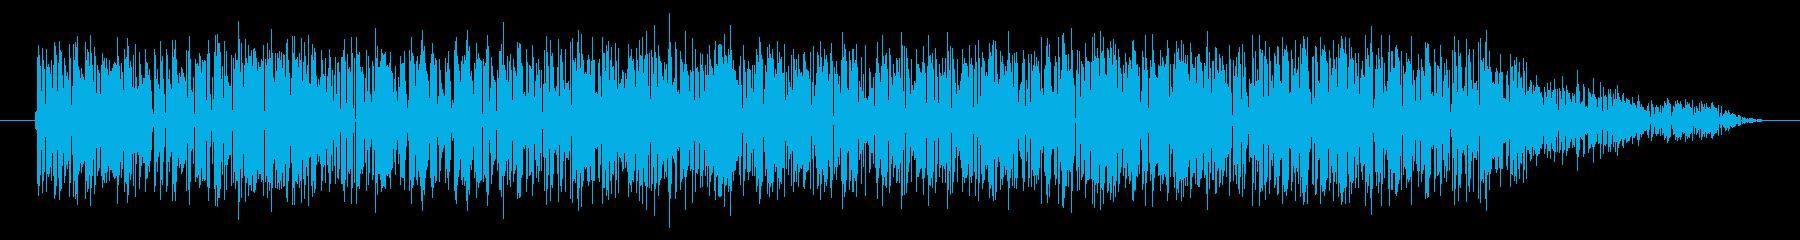 【NES RPG02-11(崩壊)】の再生済みの波形